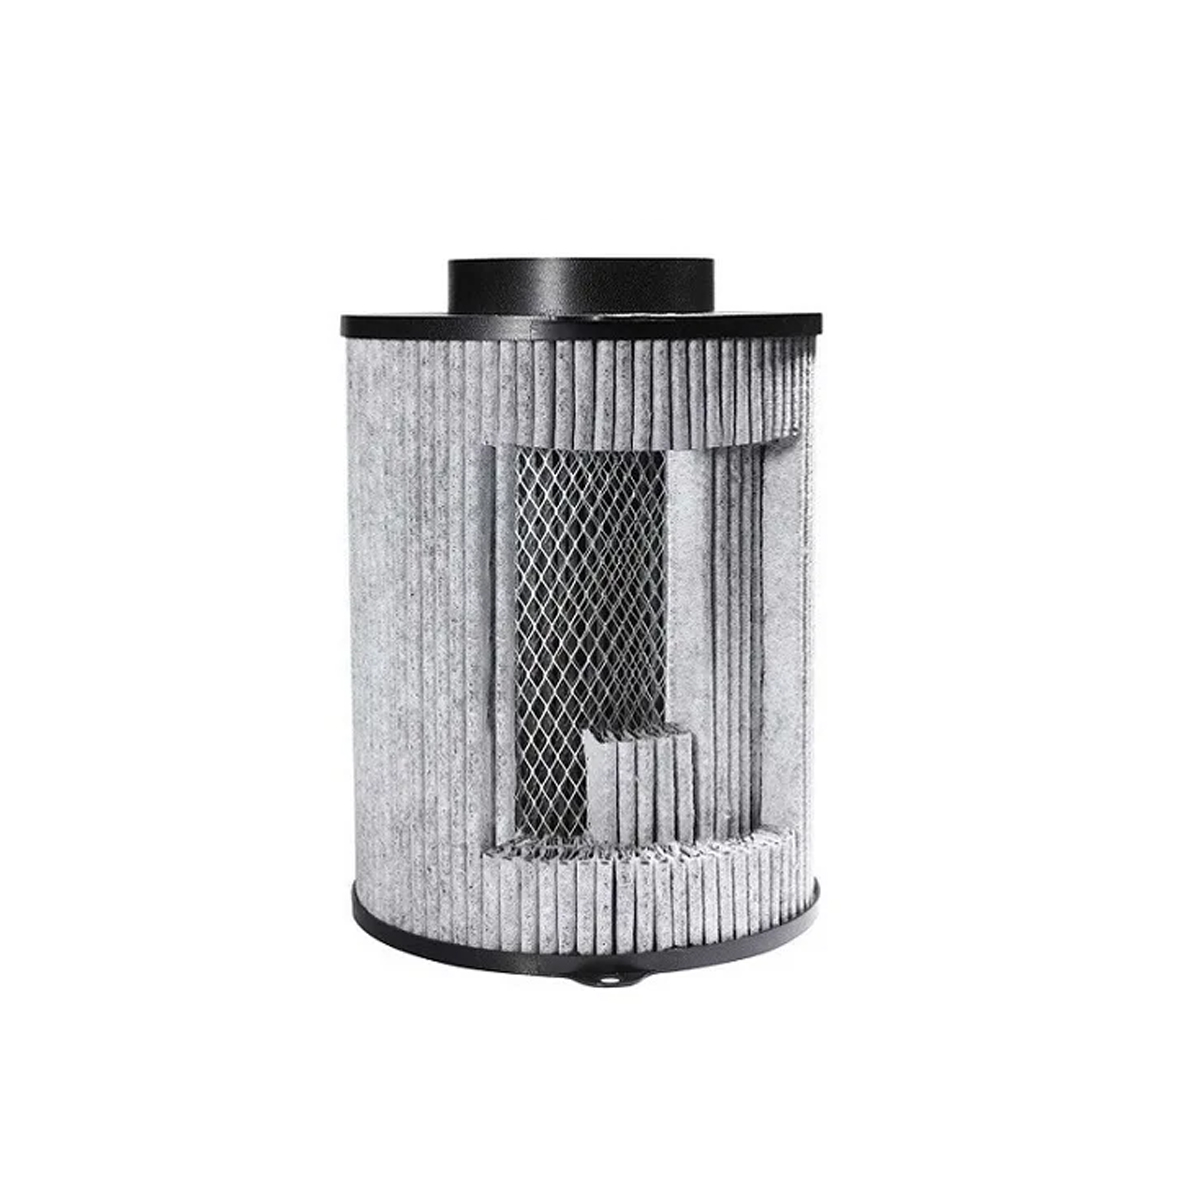 Filtro De Carbono Proactiv 150mm 460m3/h